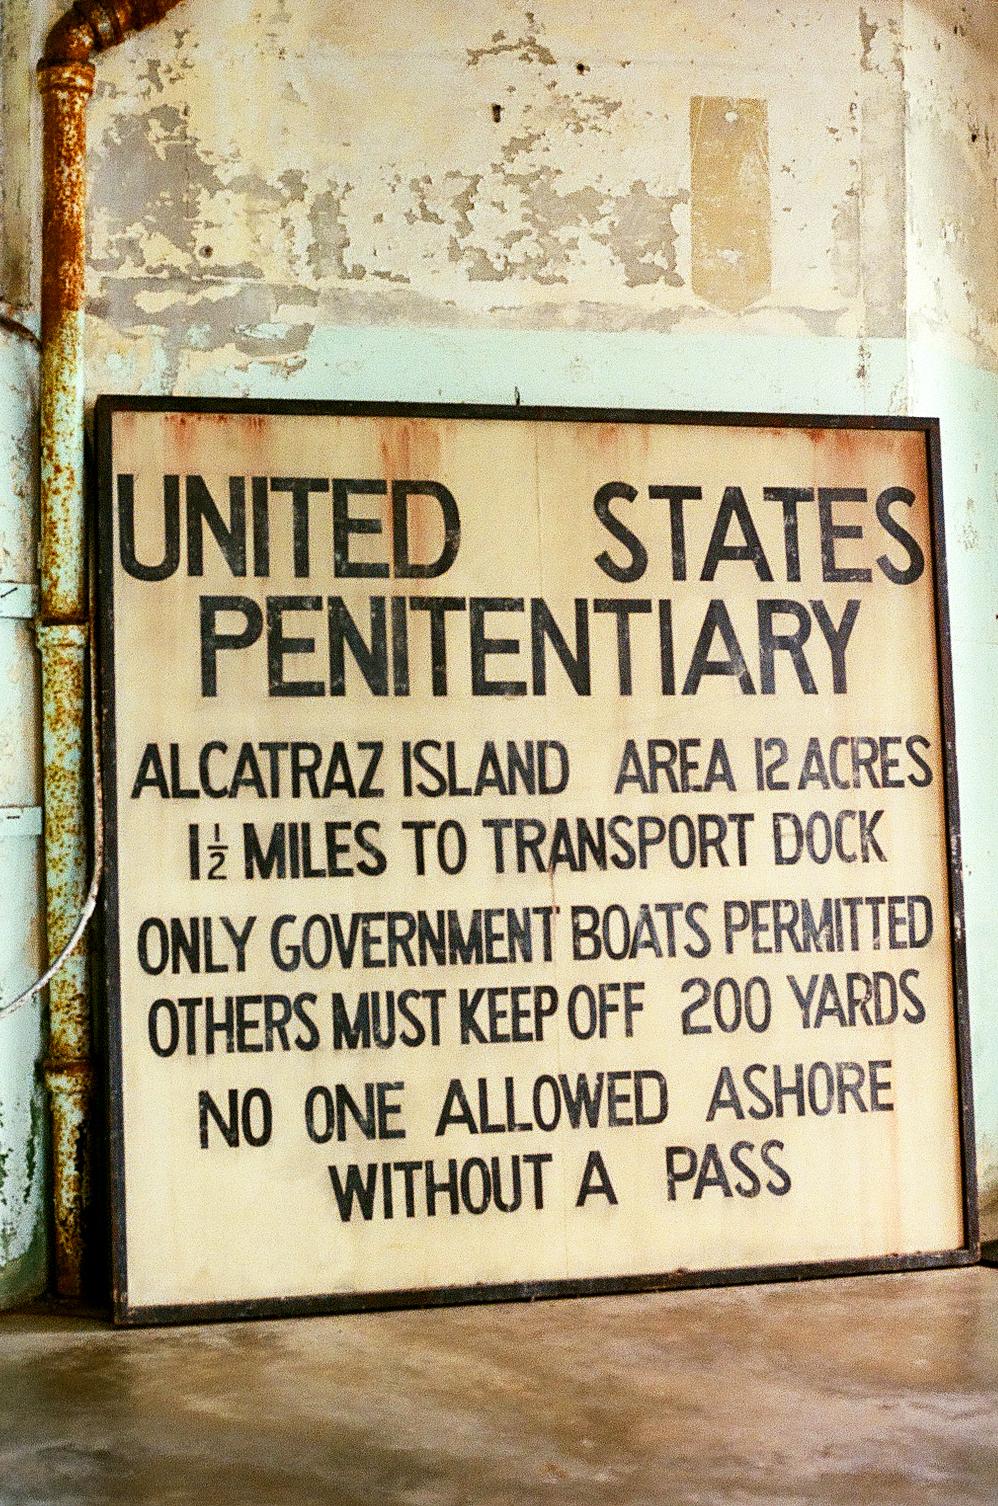 MichelleAlynn_Shot_AlcatrazIsland_03